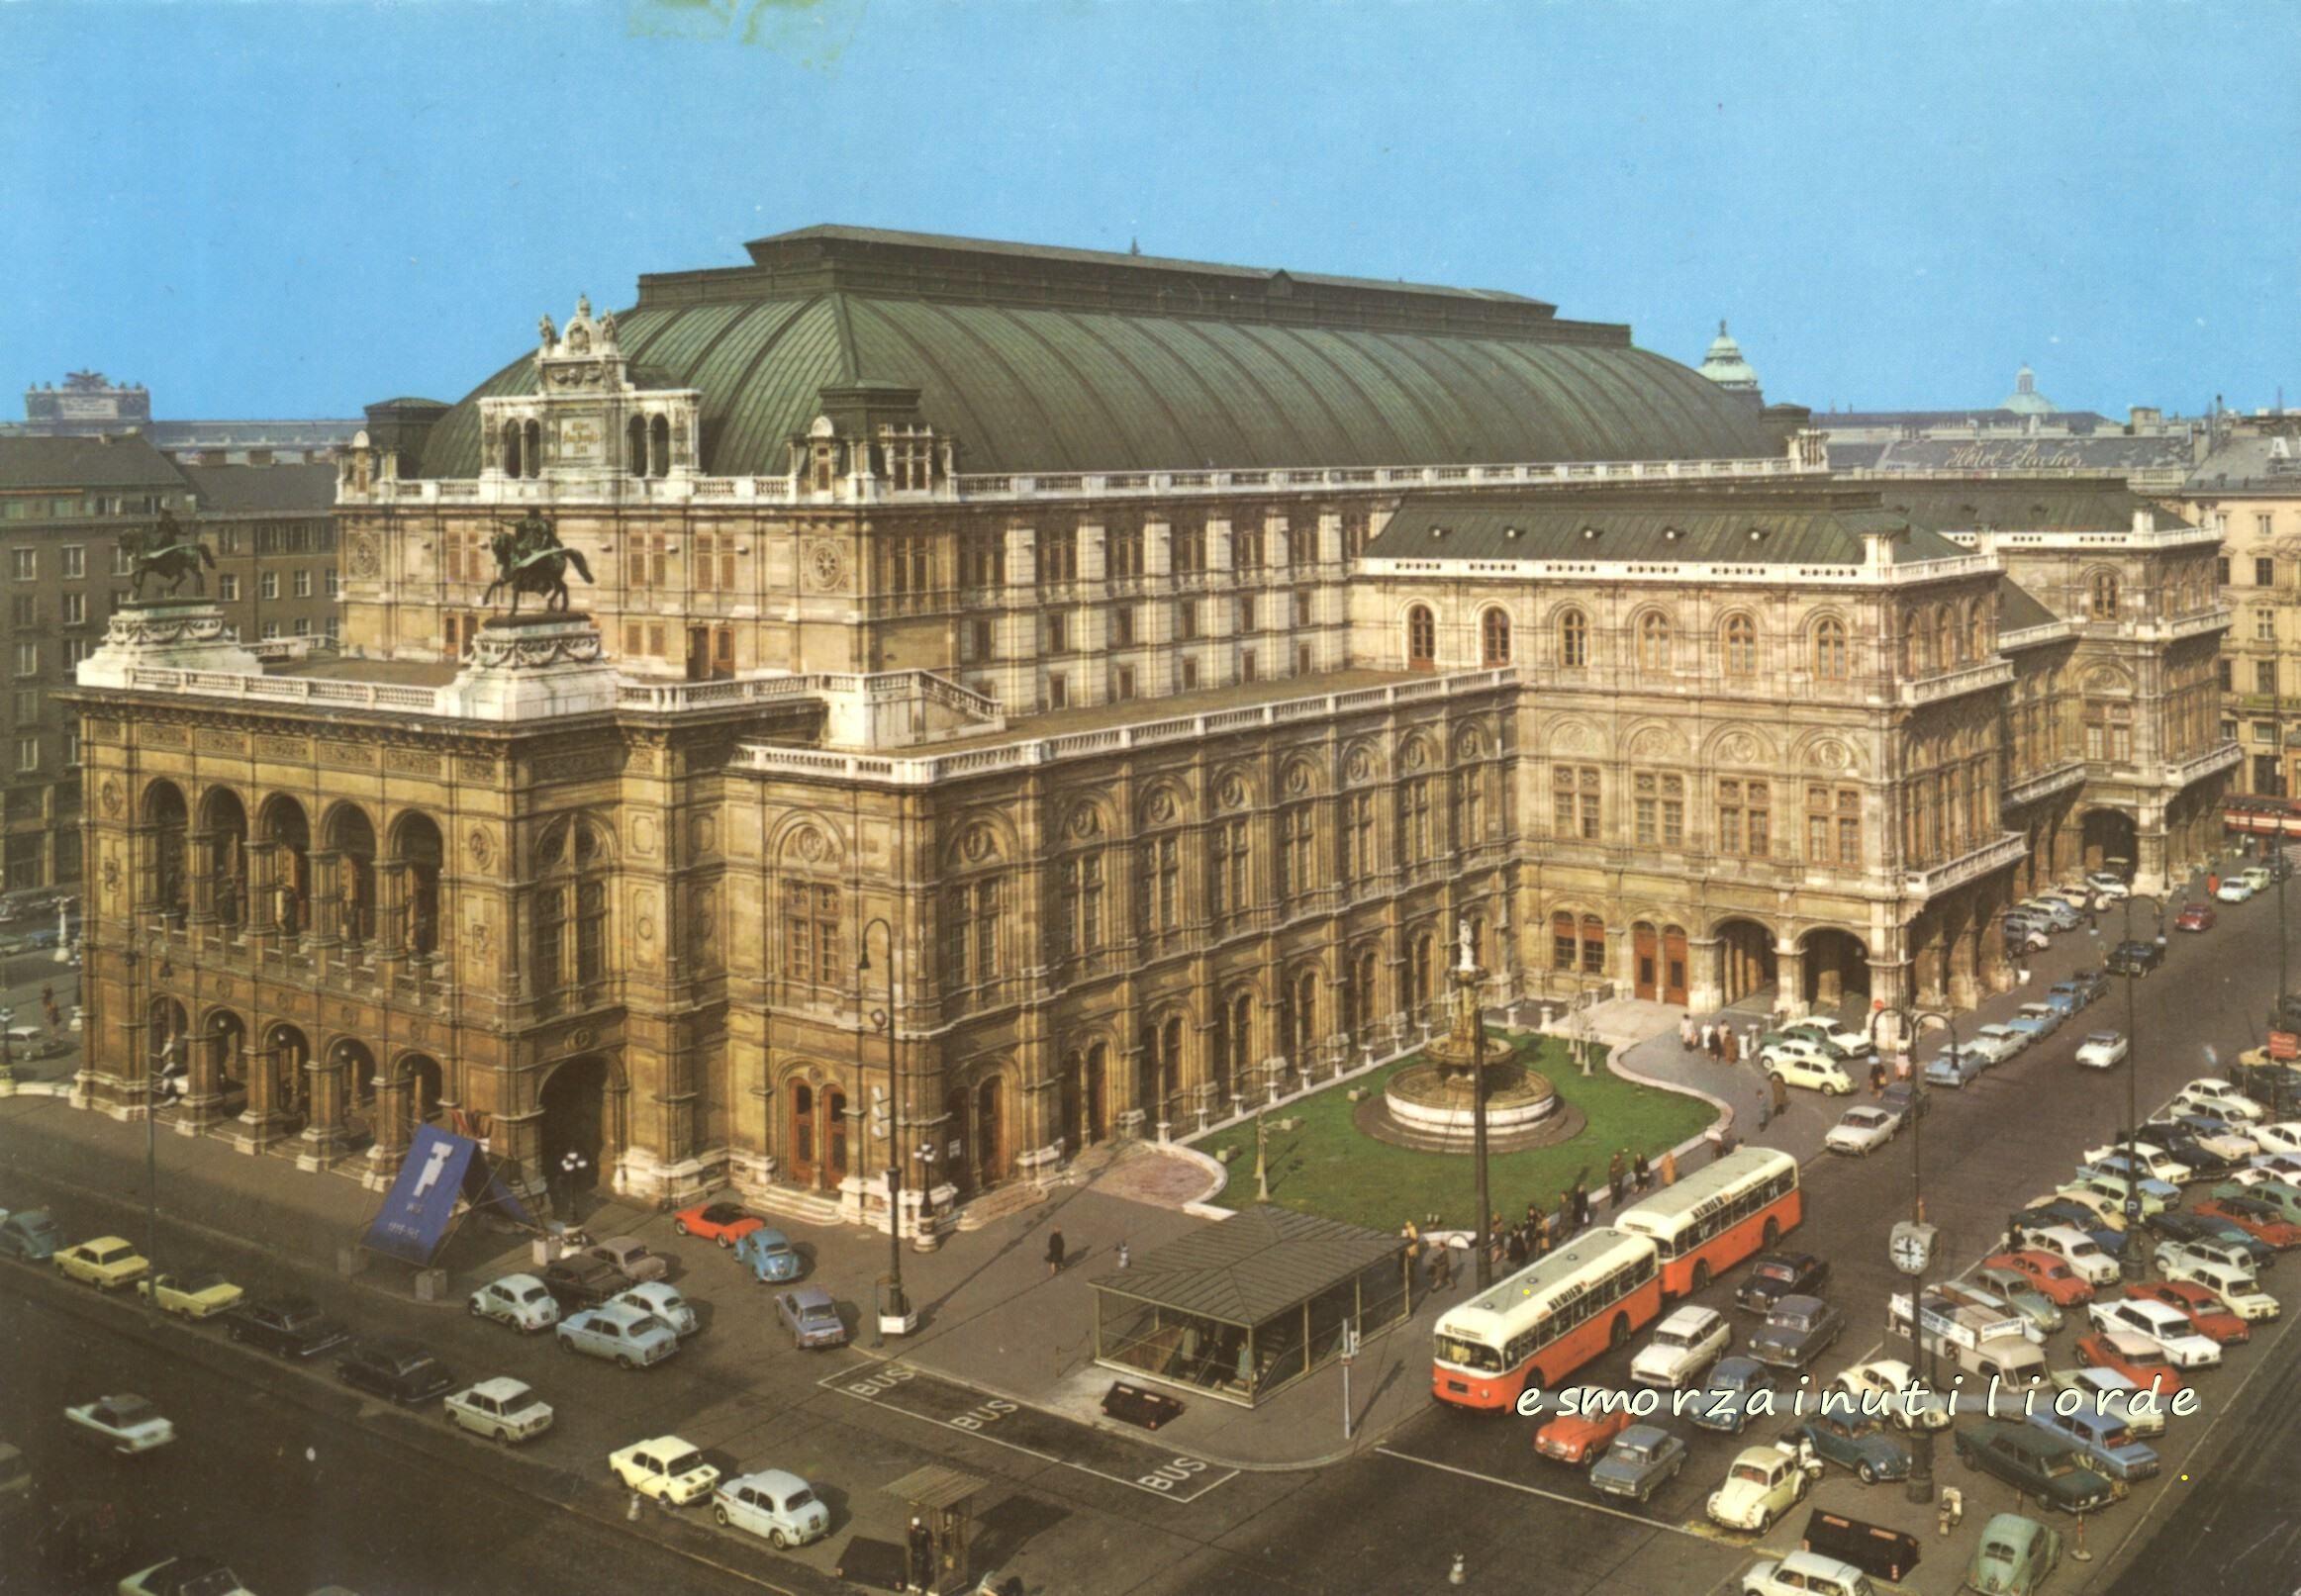 1982 - Vienna - l'Opera di Stato - OperaHouse - Staatsoper -  cartolina, monumento, panorama, piazza, postcard, square